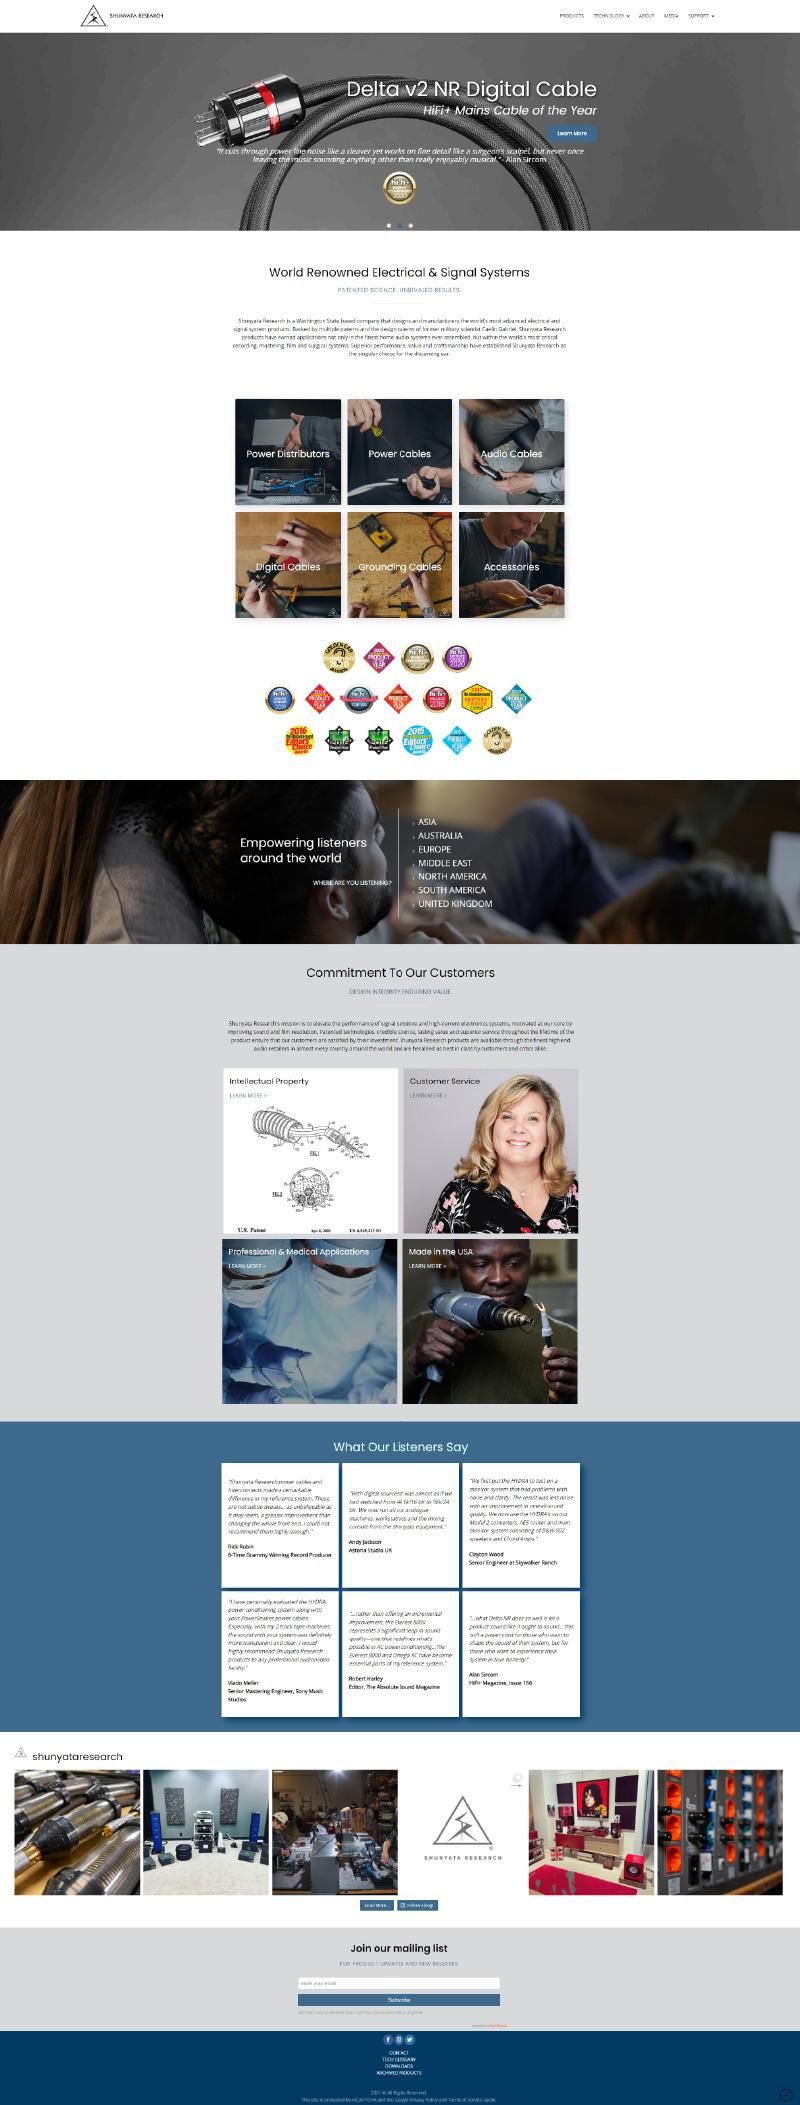 Homepage screen capture of Shunyata website